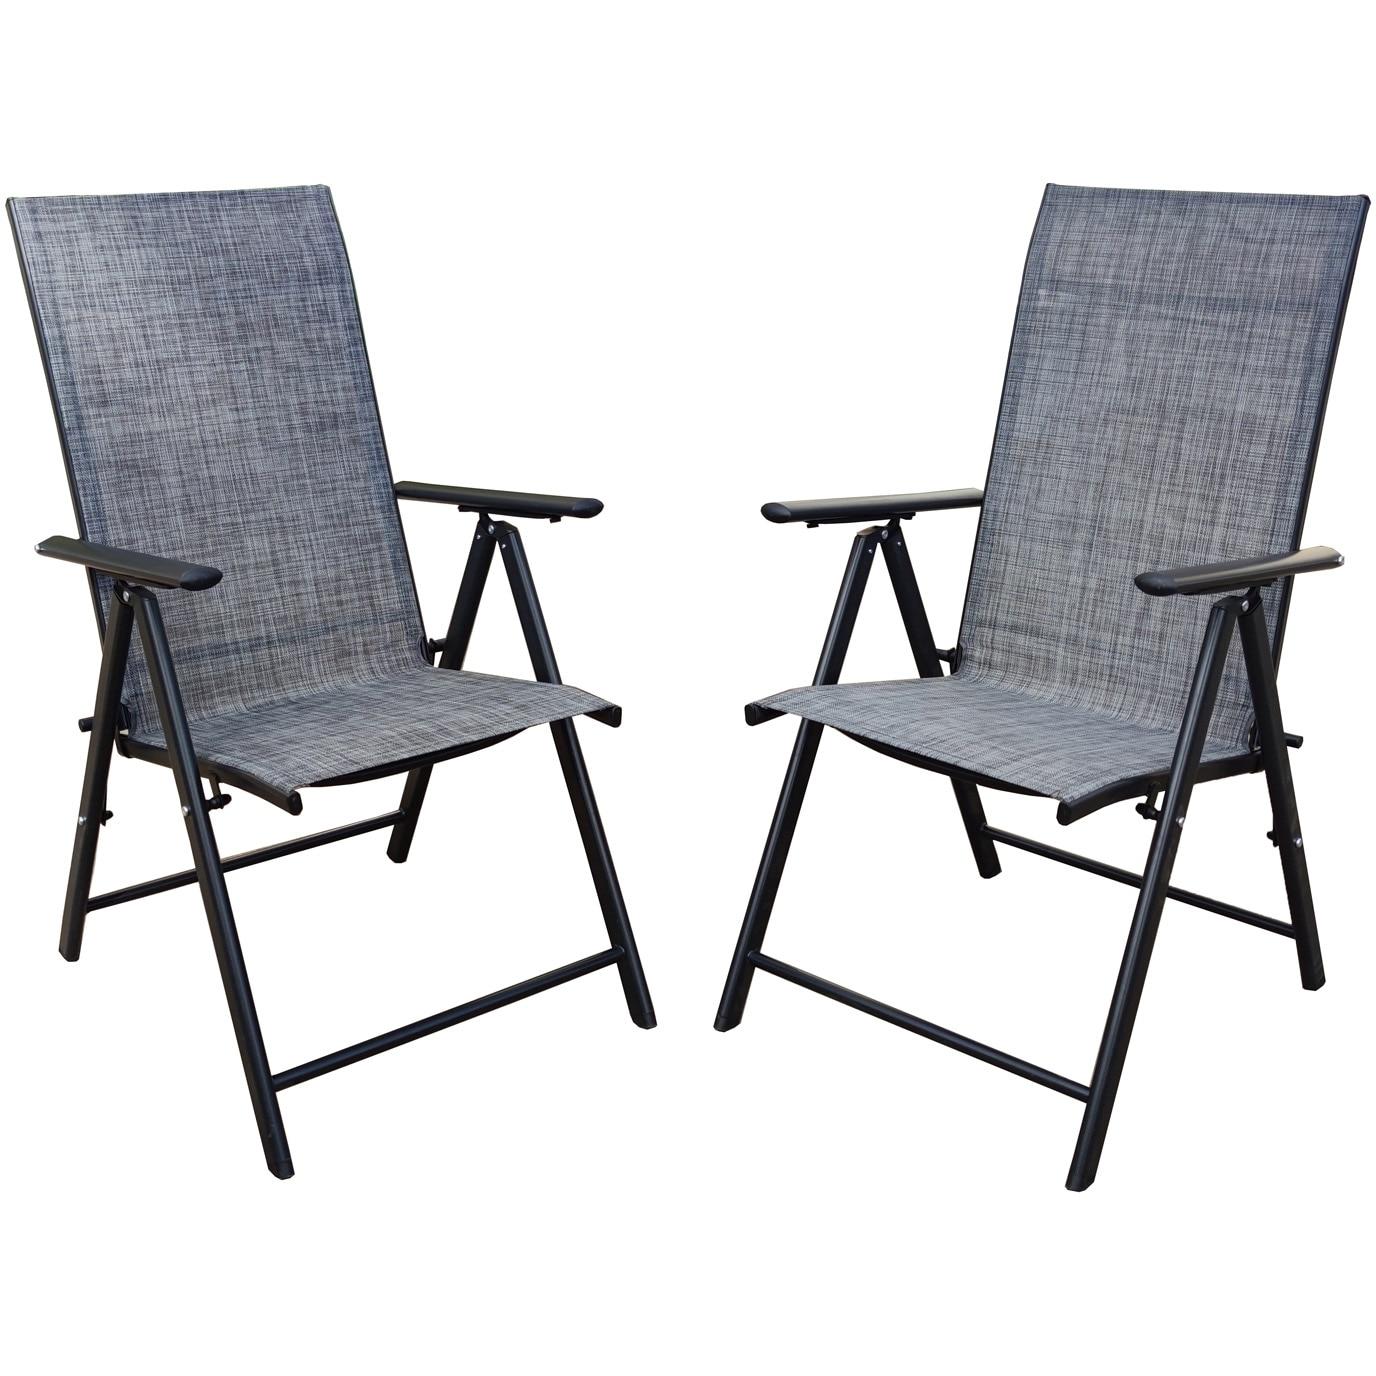 Set 2 Scaune gradina/terasa/balcon pliabile Kring Bie metal, 69 x 55 x 102 cm, reglabil 7 pozitii, c